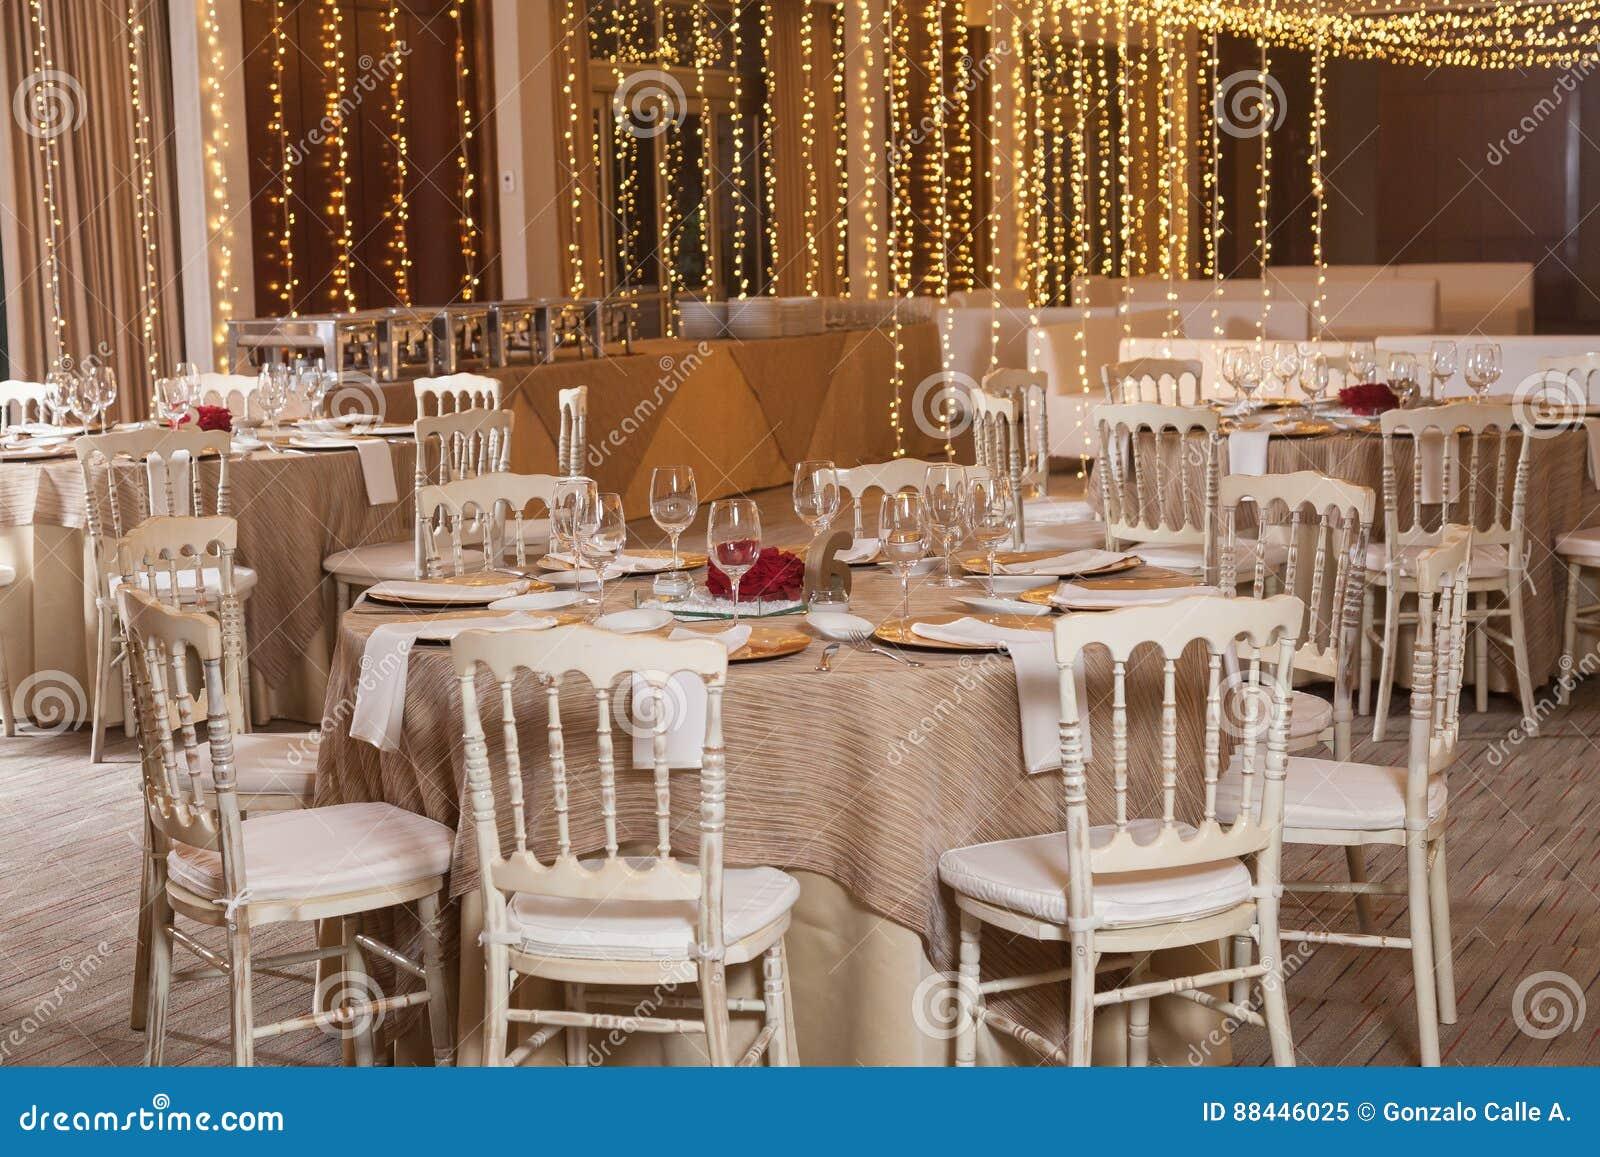 Elegant Centerpieces for Party